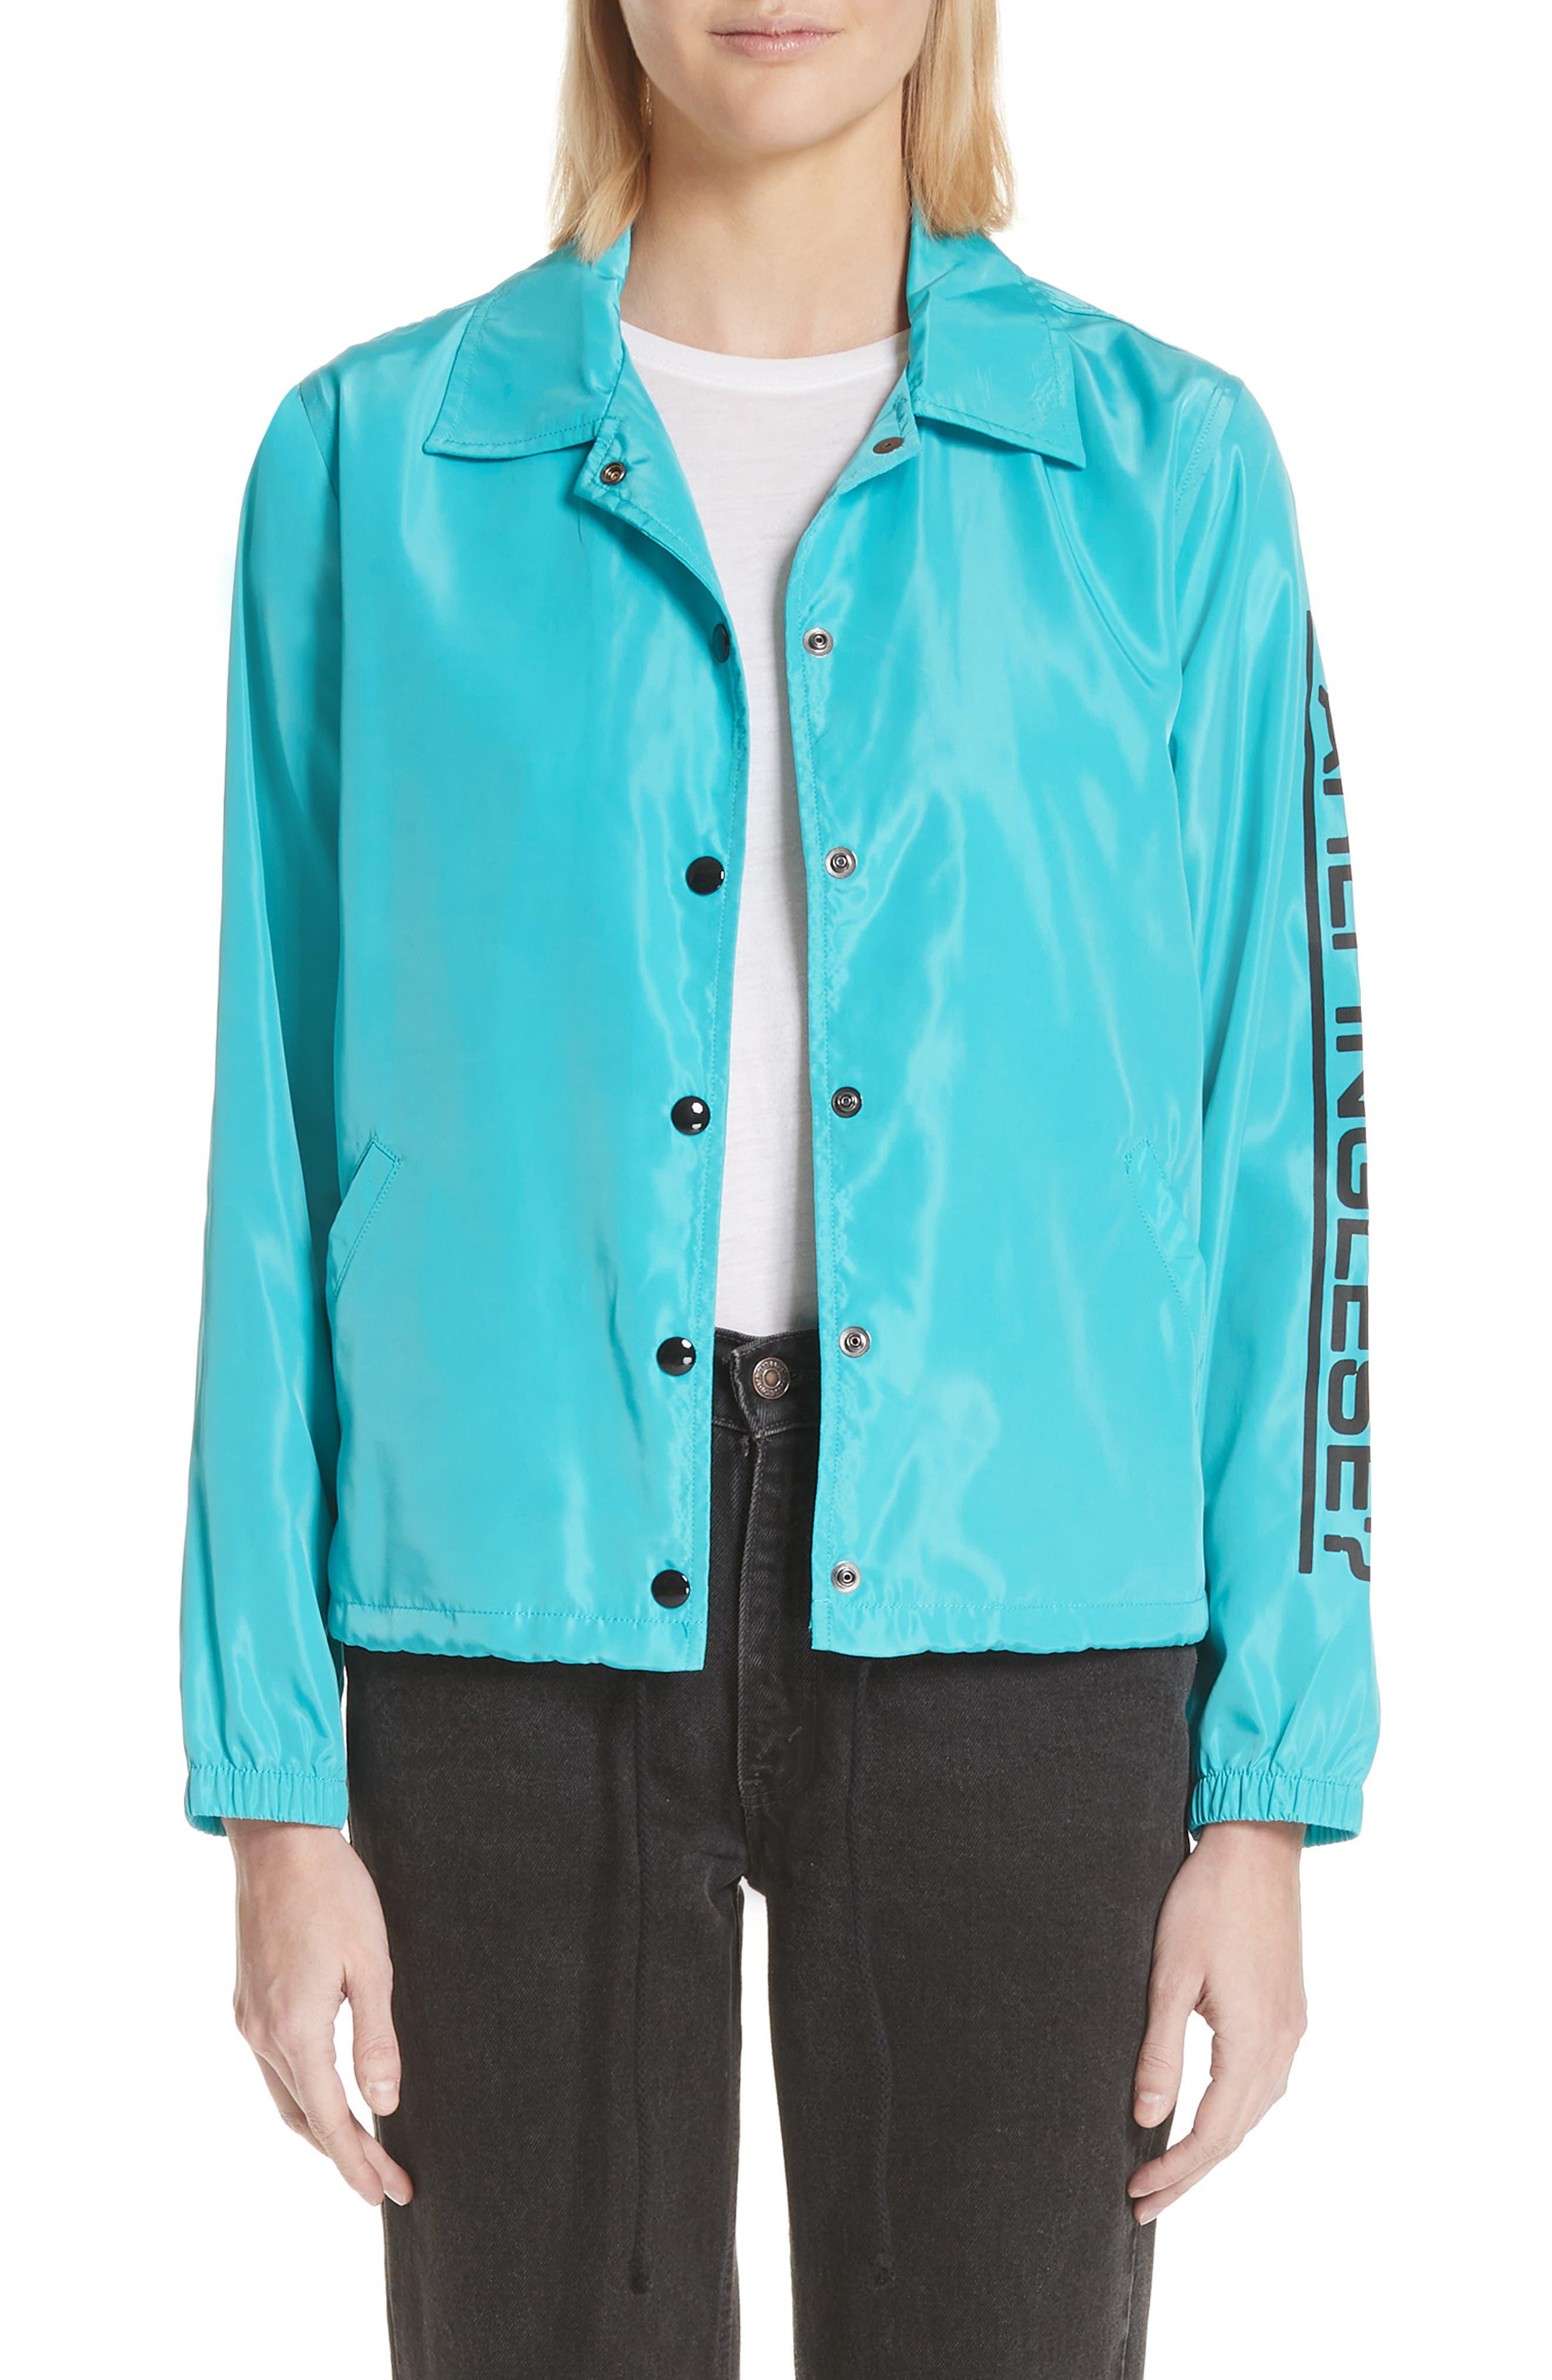 Parli Inglese Coach Jacket,                         Main,                         color, 440